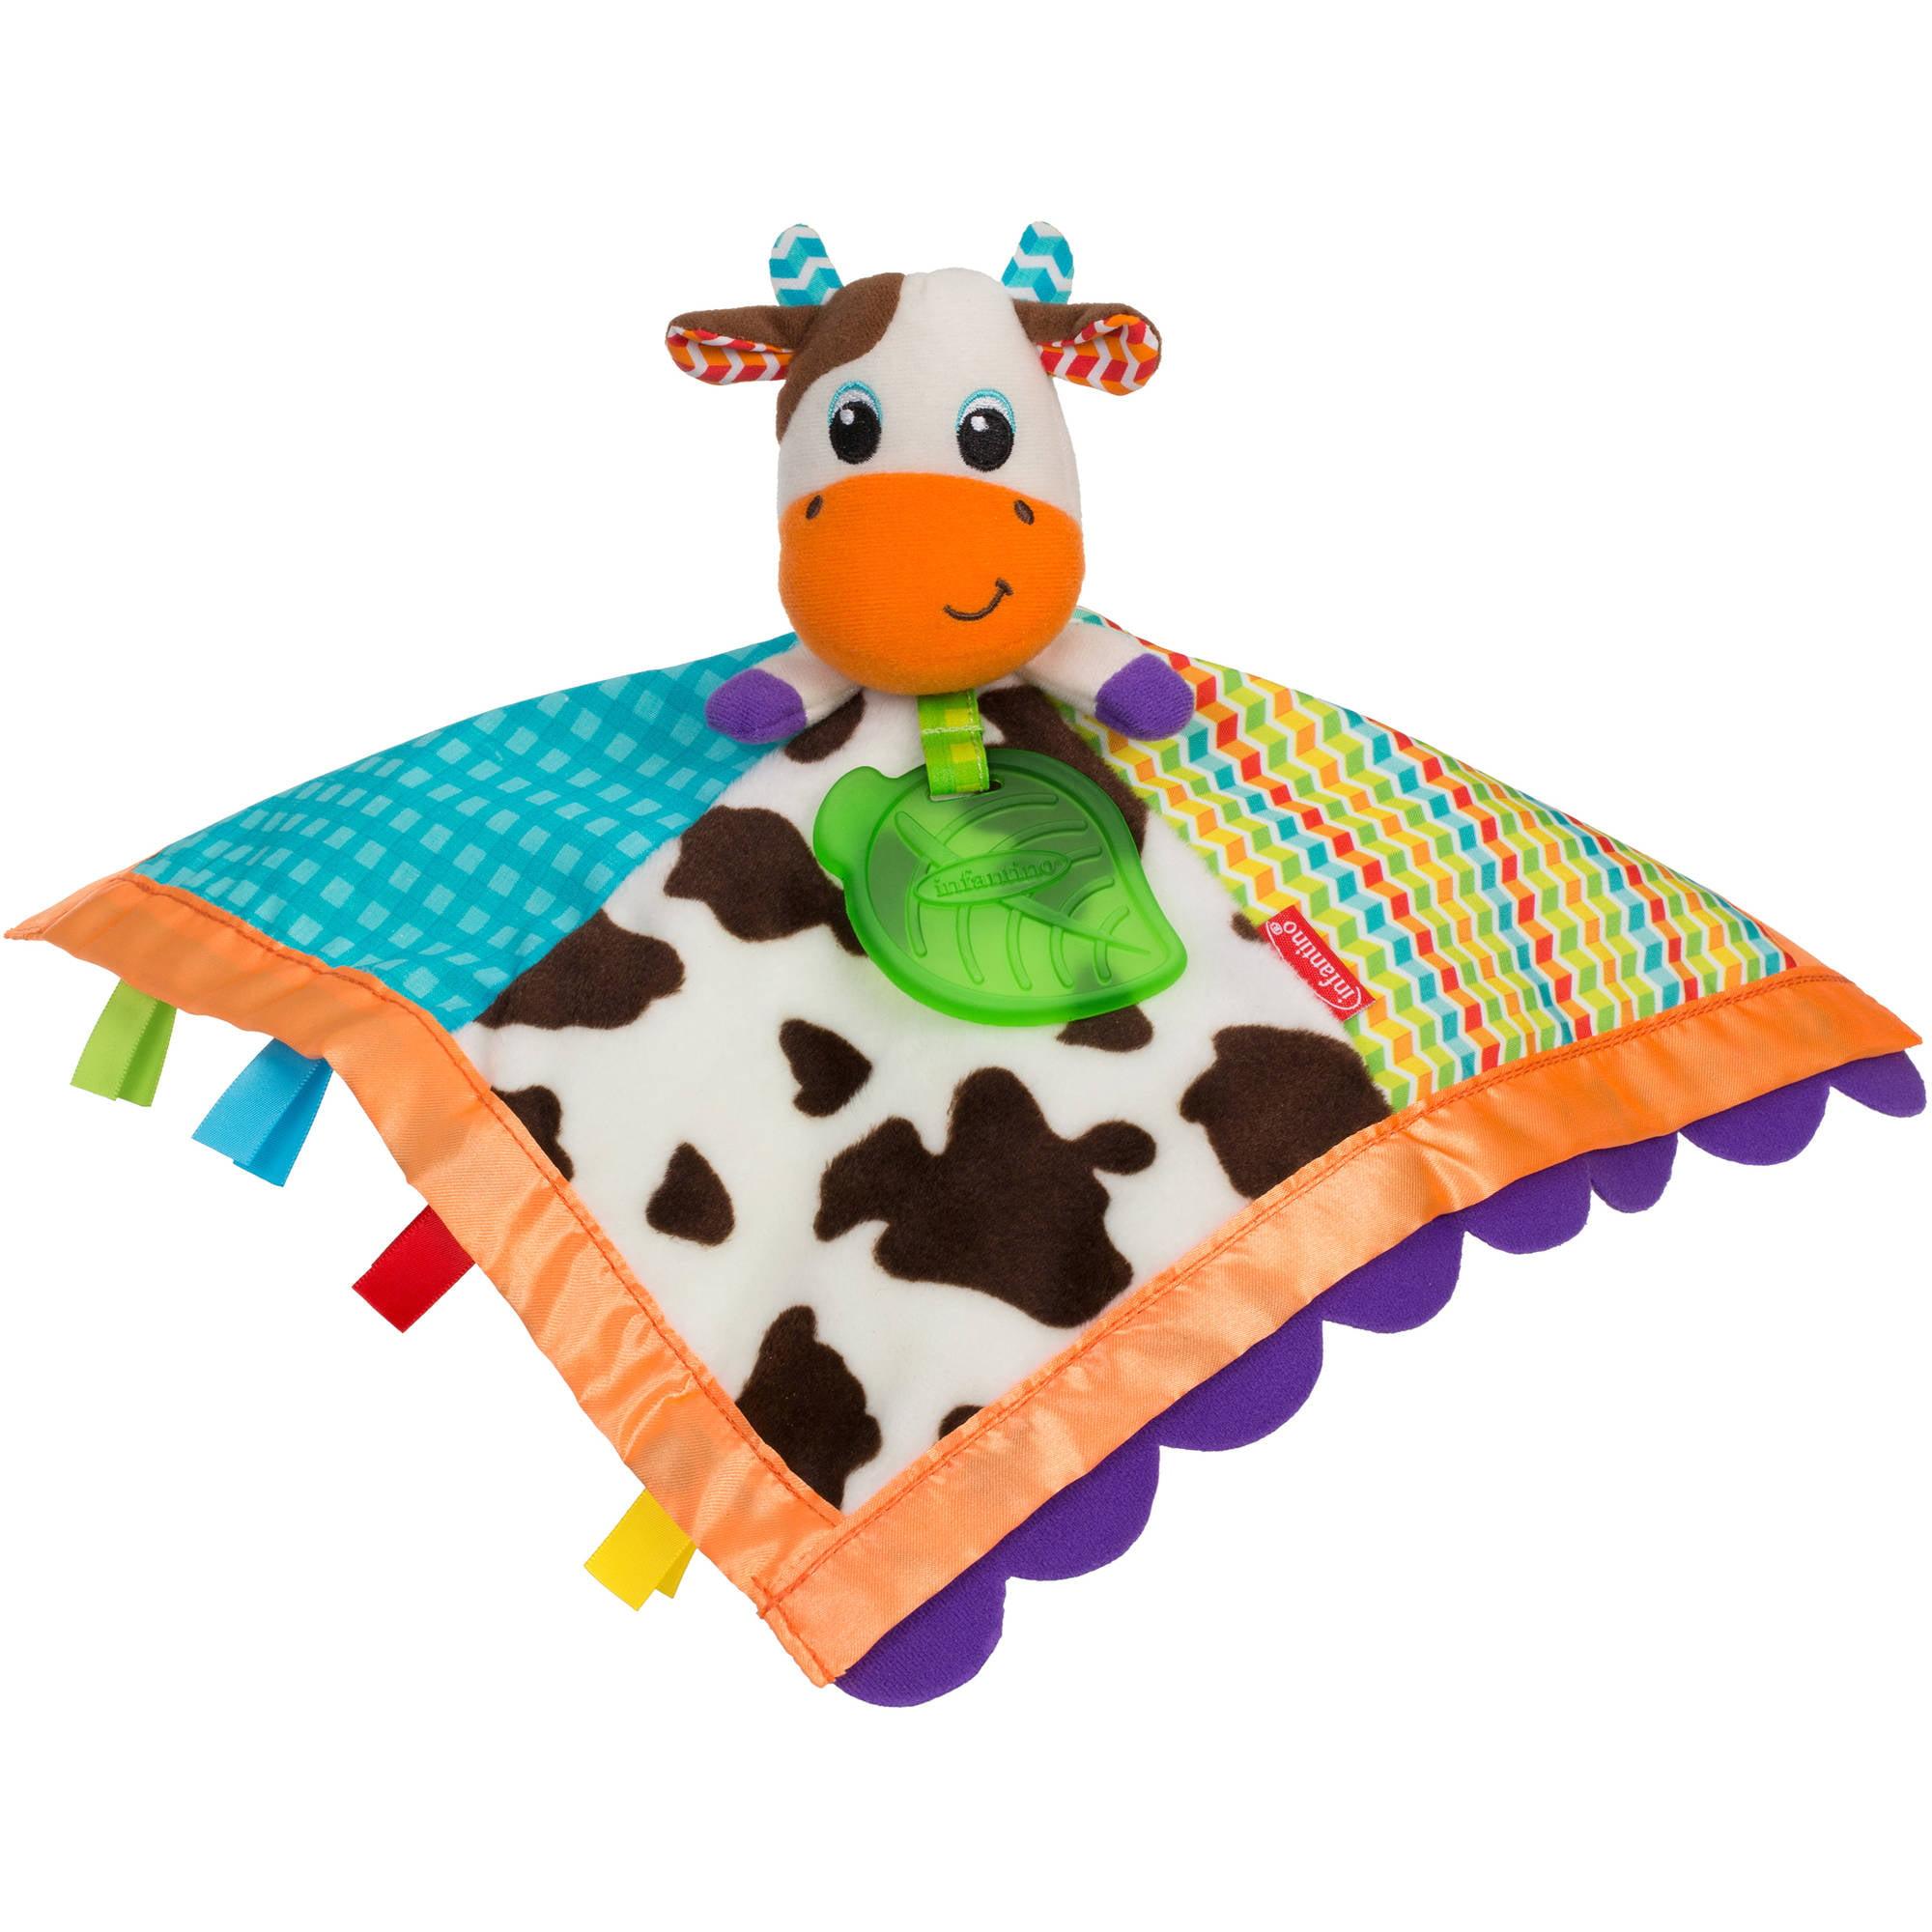 Infantino Topsy Turvy Soft & Snuggly Lovie Pal Cow